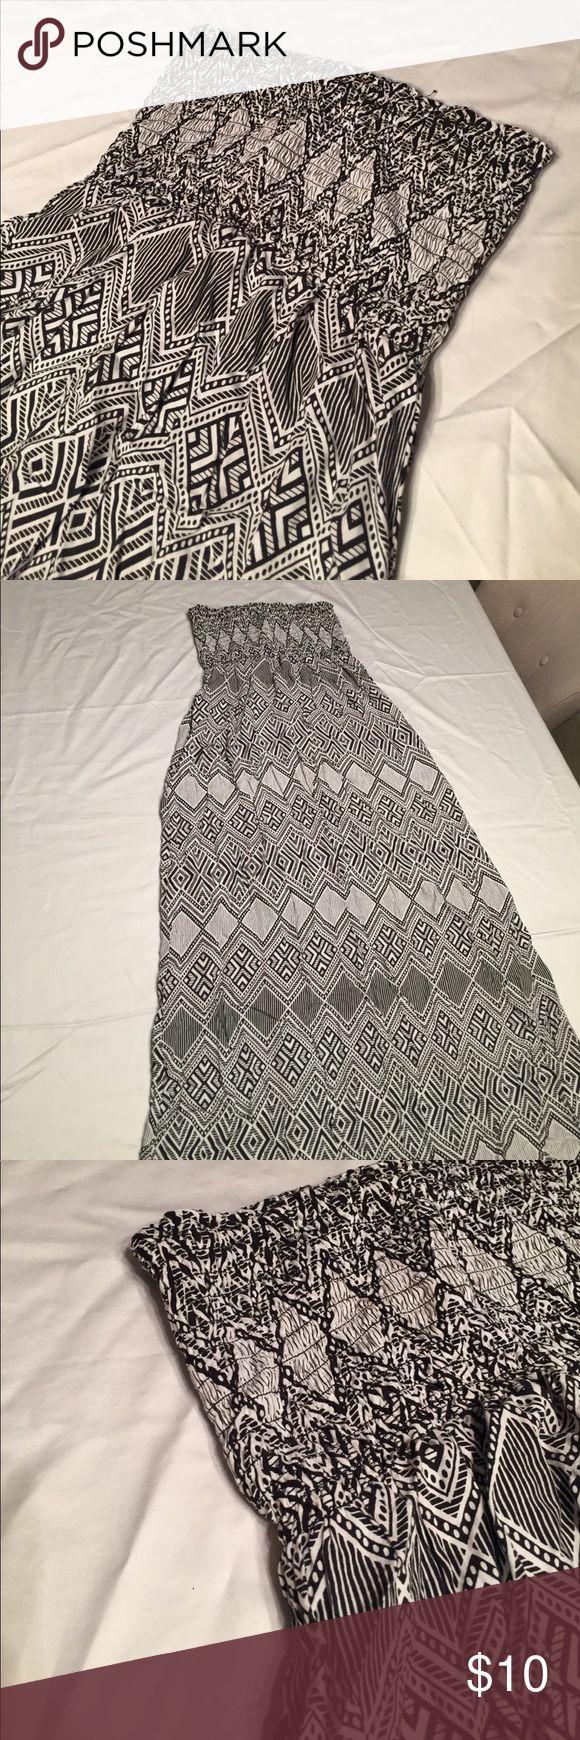 Black and white boho maxi dress Black and white boho maxi dress Dresses Maxi